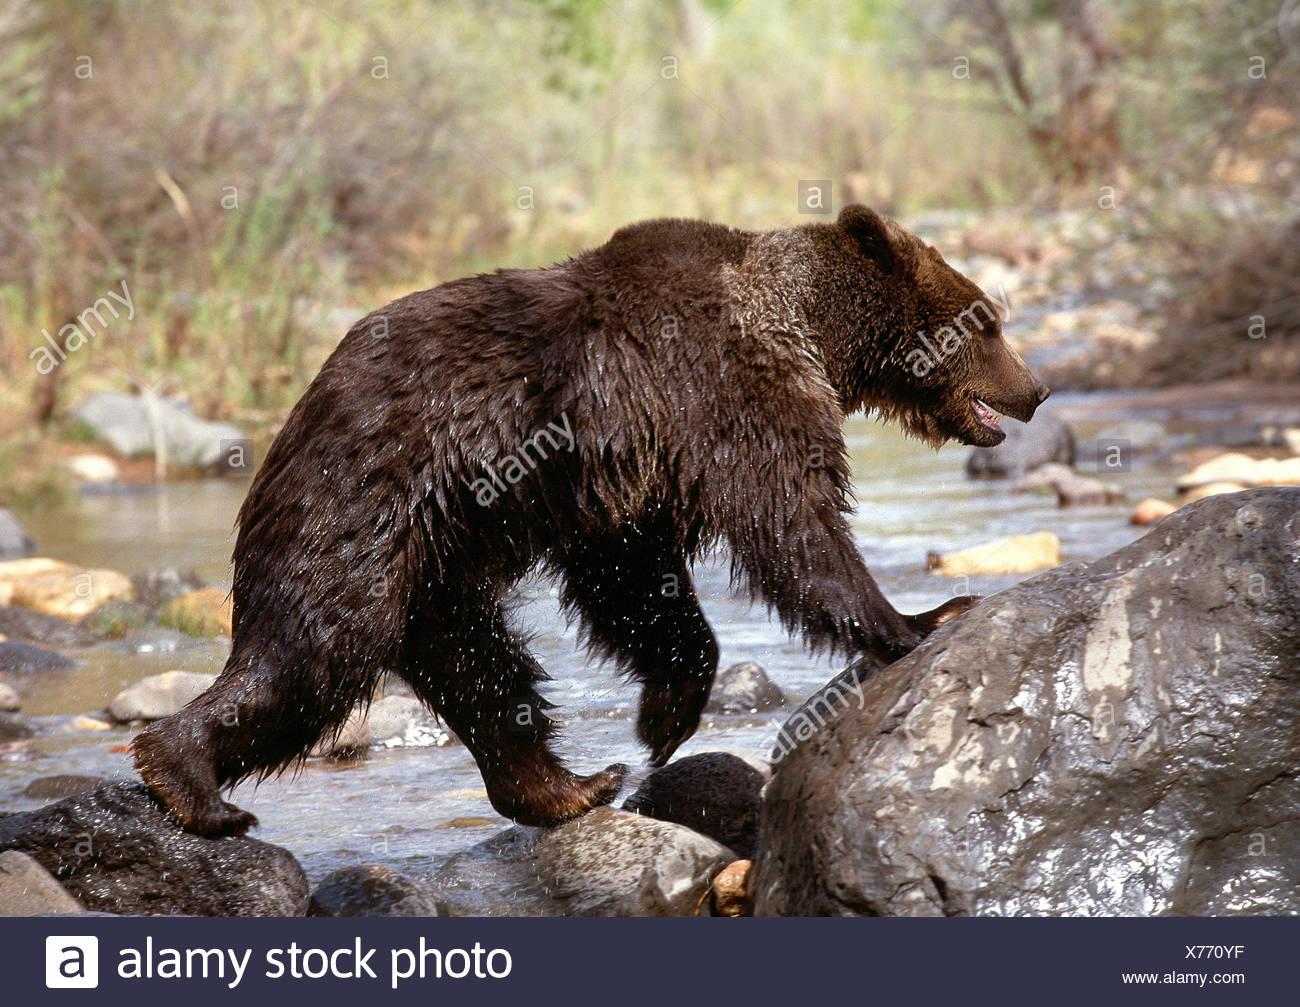 Usa. utah. la faune. grizzly traversant une rivière. Photo Stock